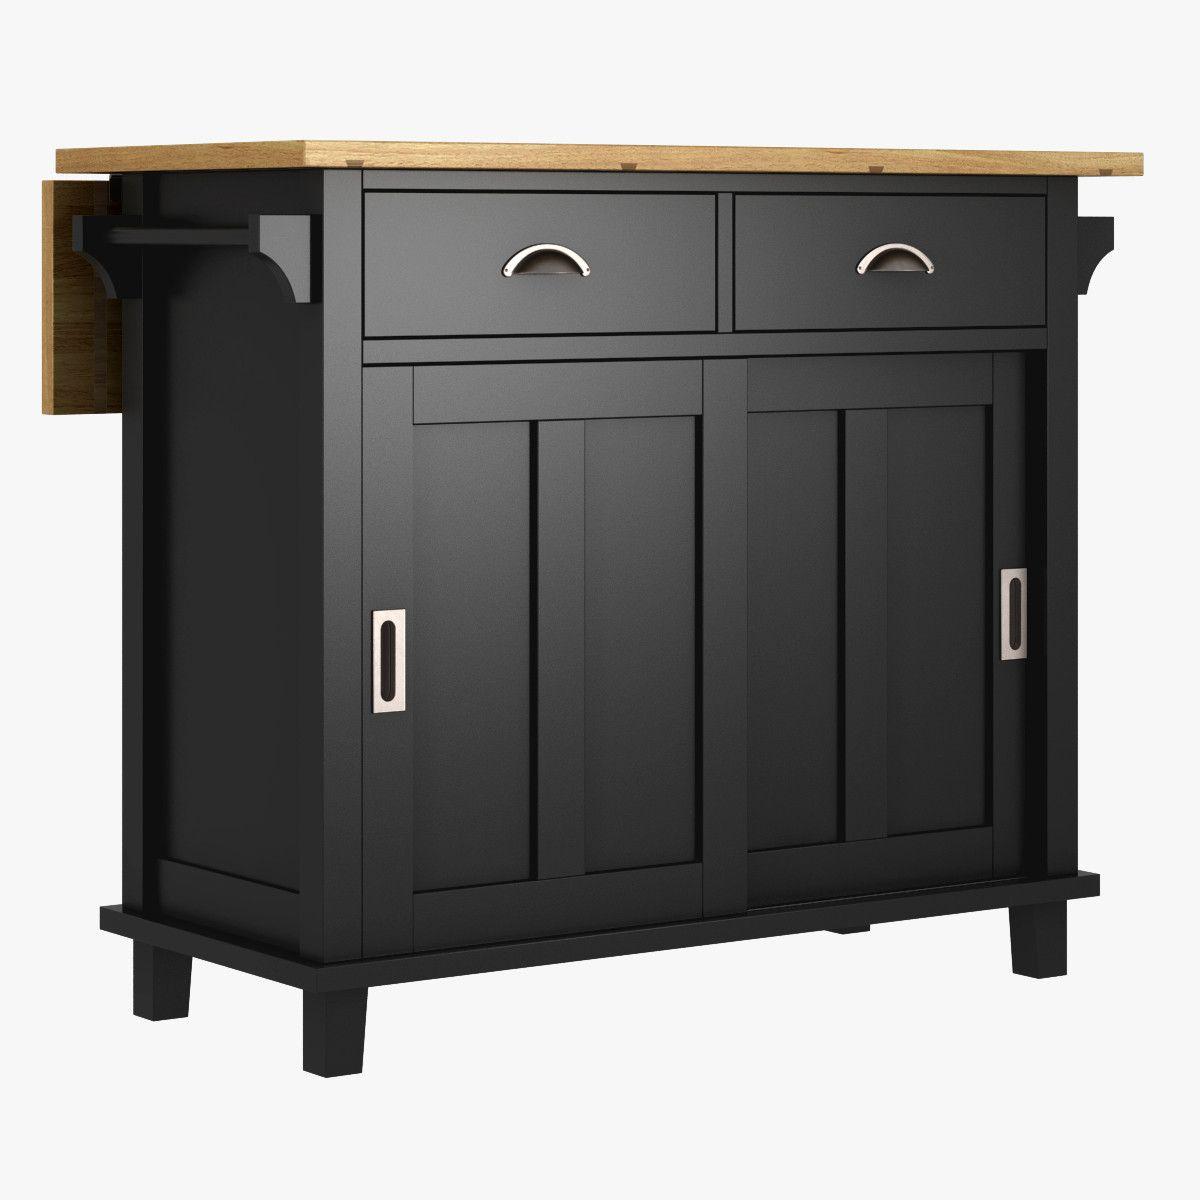 Belmont Black Kitchen Island 3d Max Belmont Kitchen Island Furniture 3d Models Pinterest